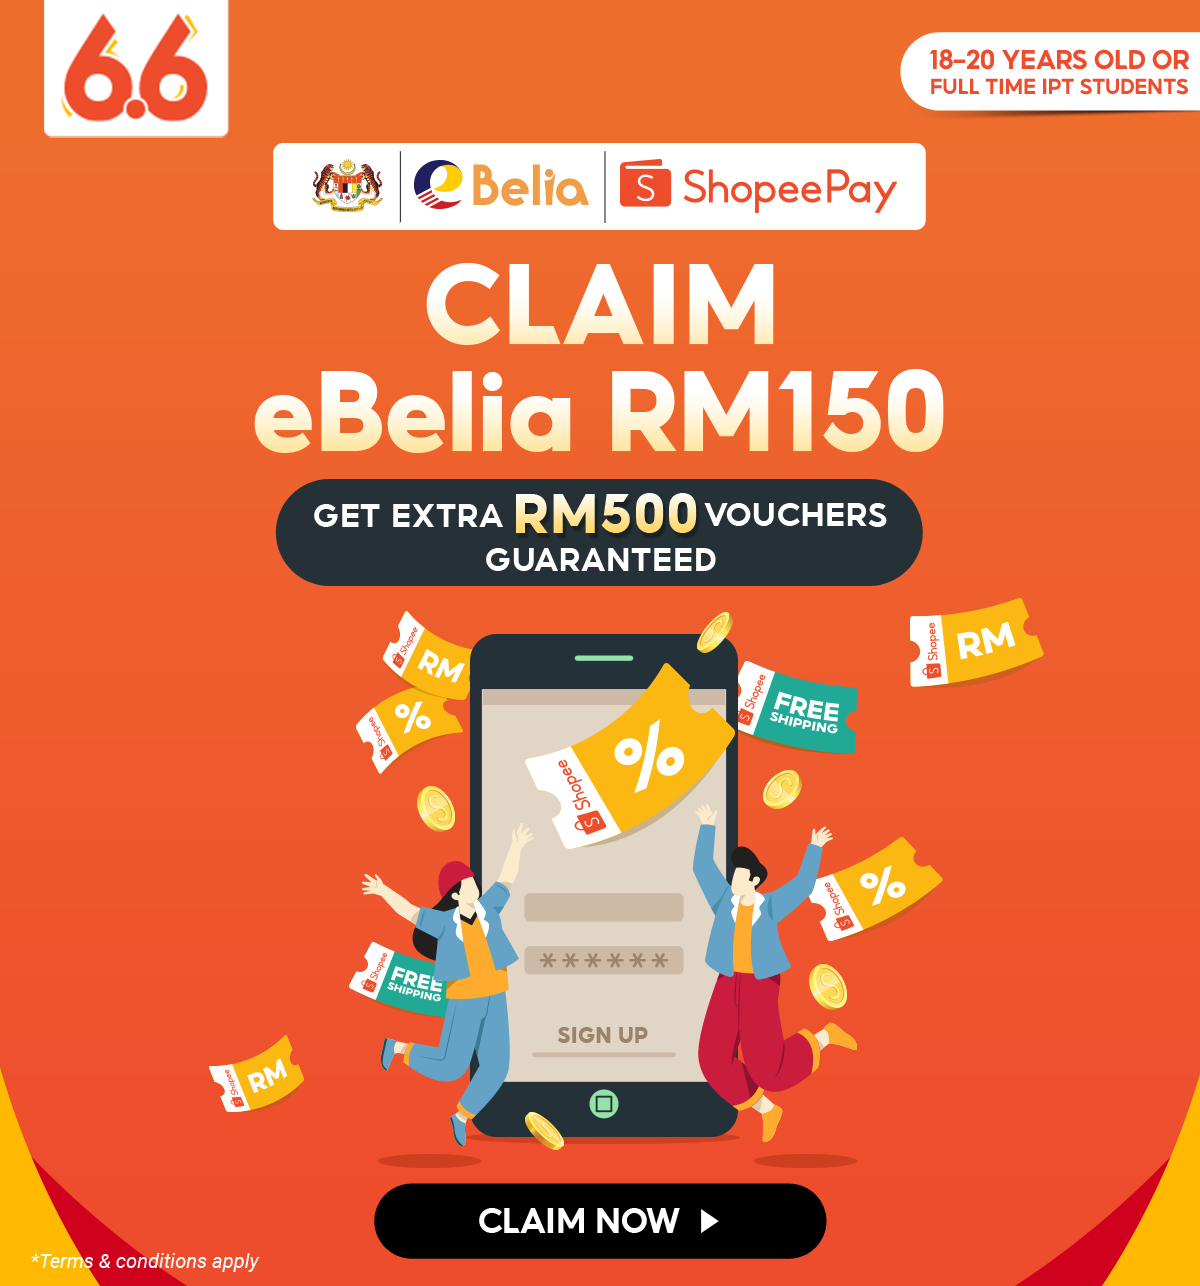 eBelia 2021 | Claim eBelia RM150 & Get Extra RM500 Vouchers | Shopee  Malaysia